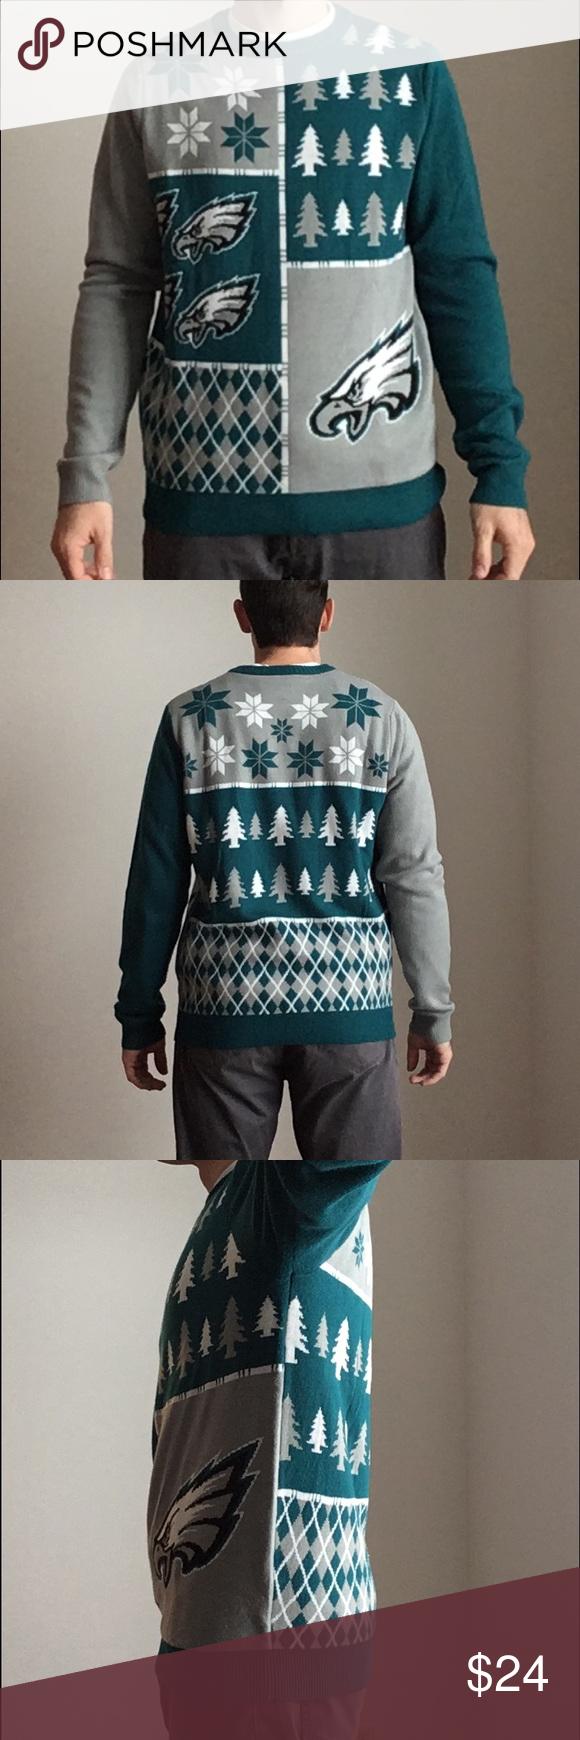 NFL Christmas Sweater Philadelphia Eagles This sweater